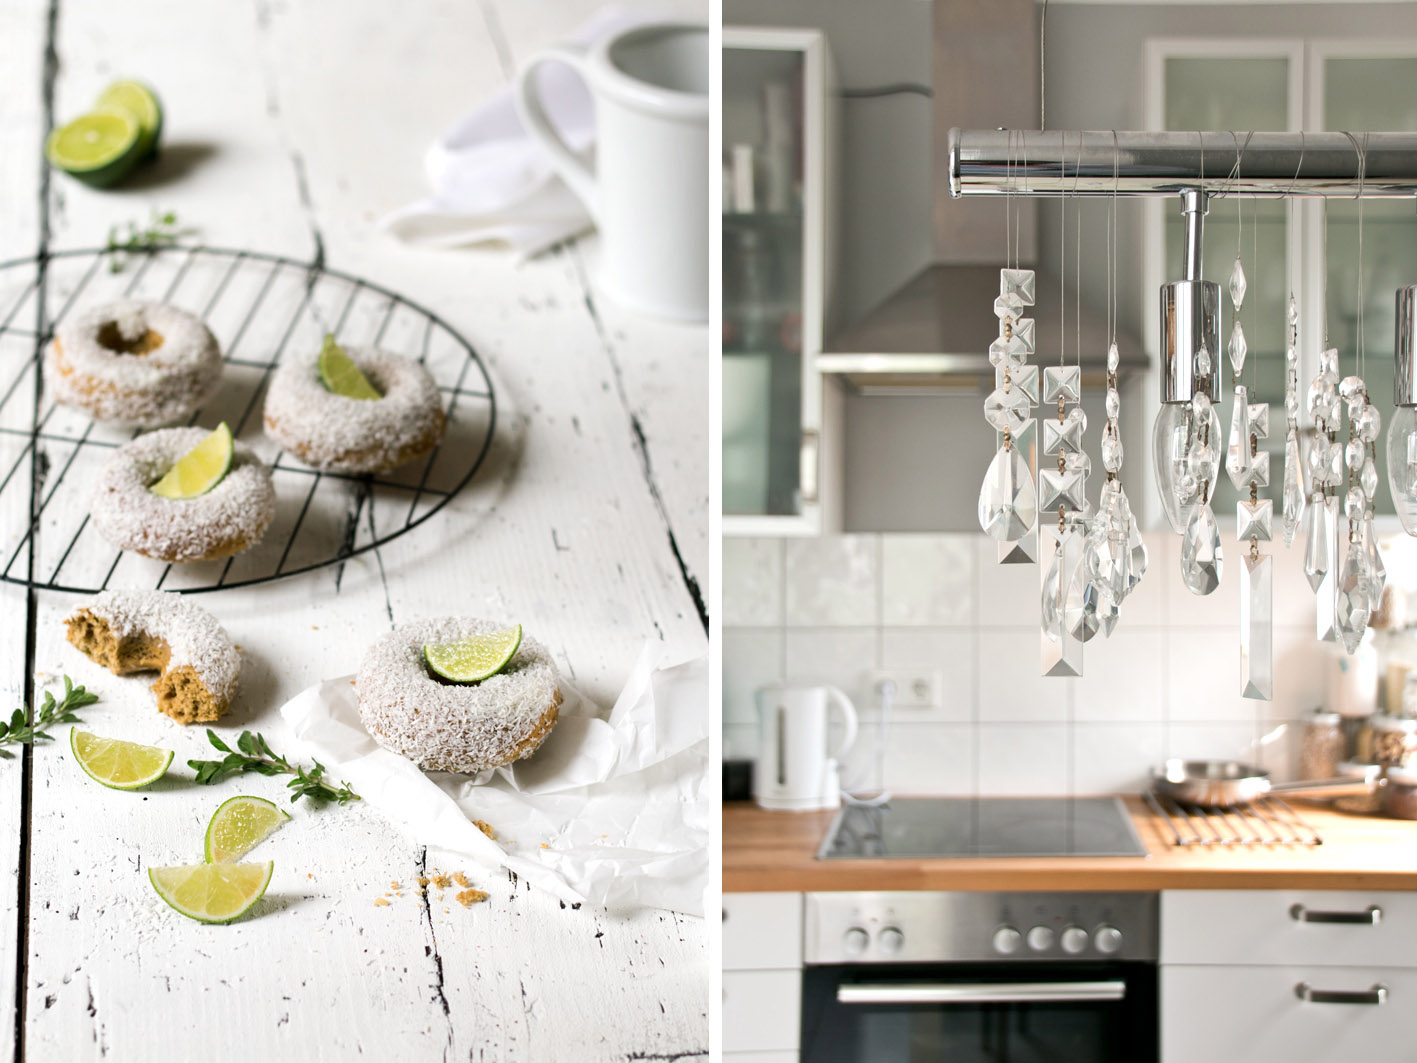 Ikea faktum küche sockelleiste ikea küche faktum einbau